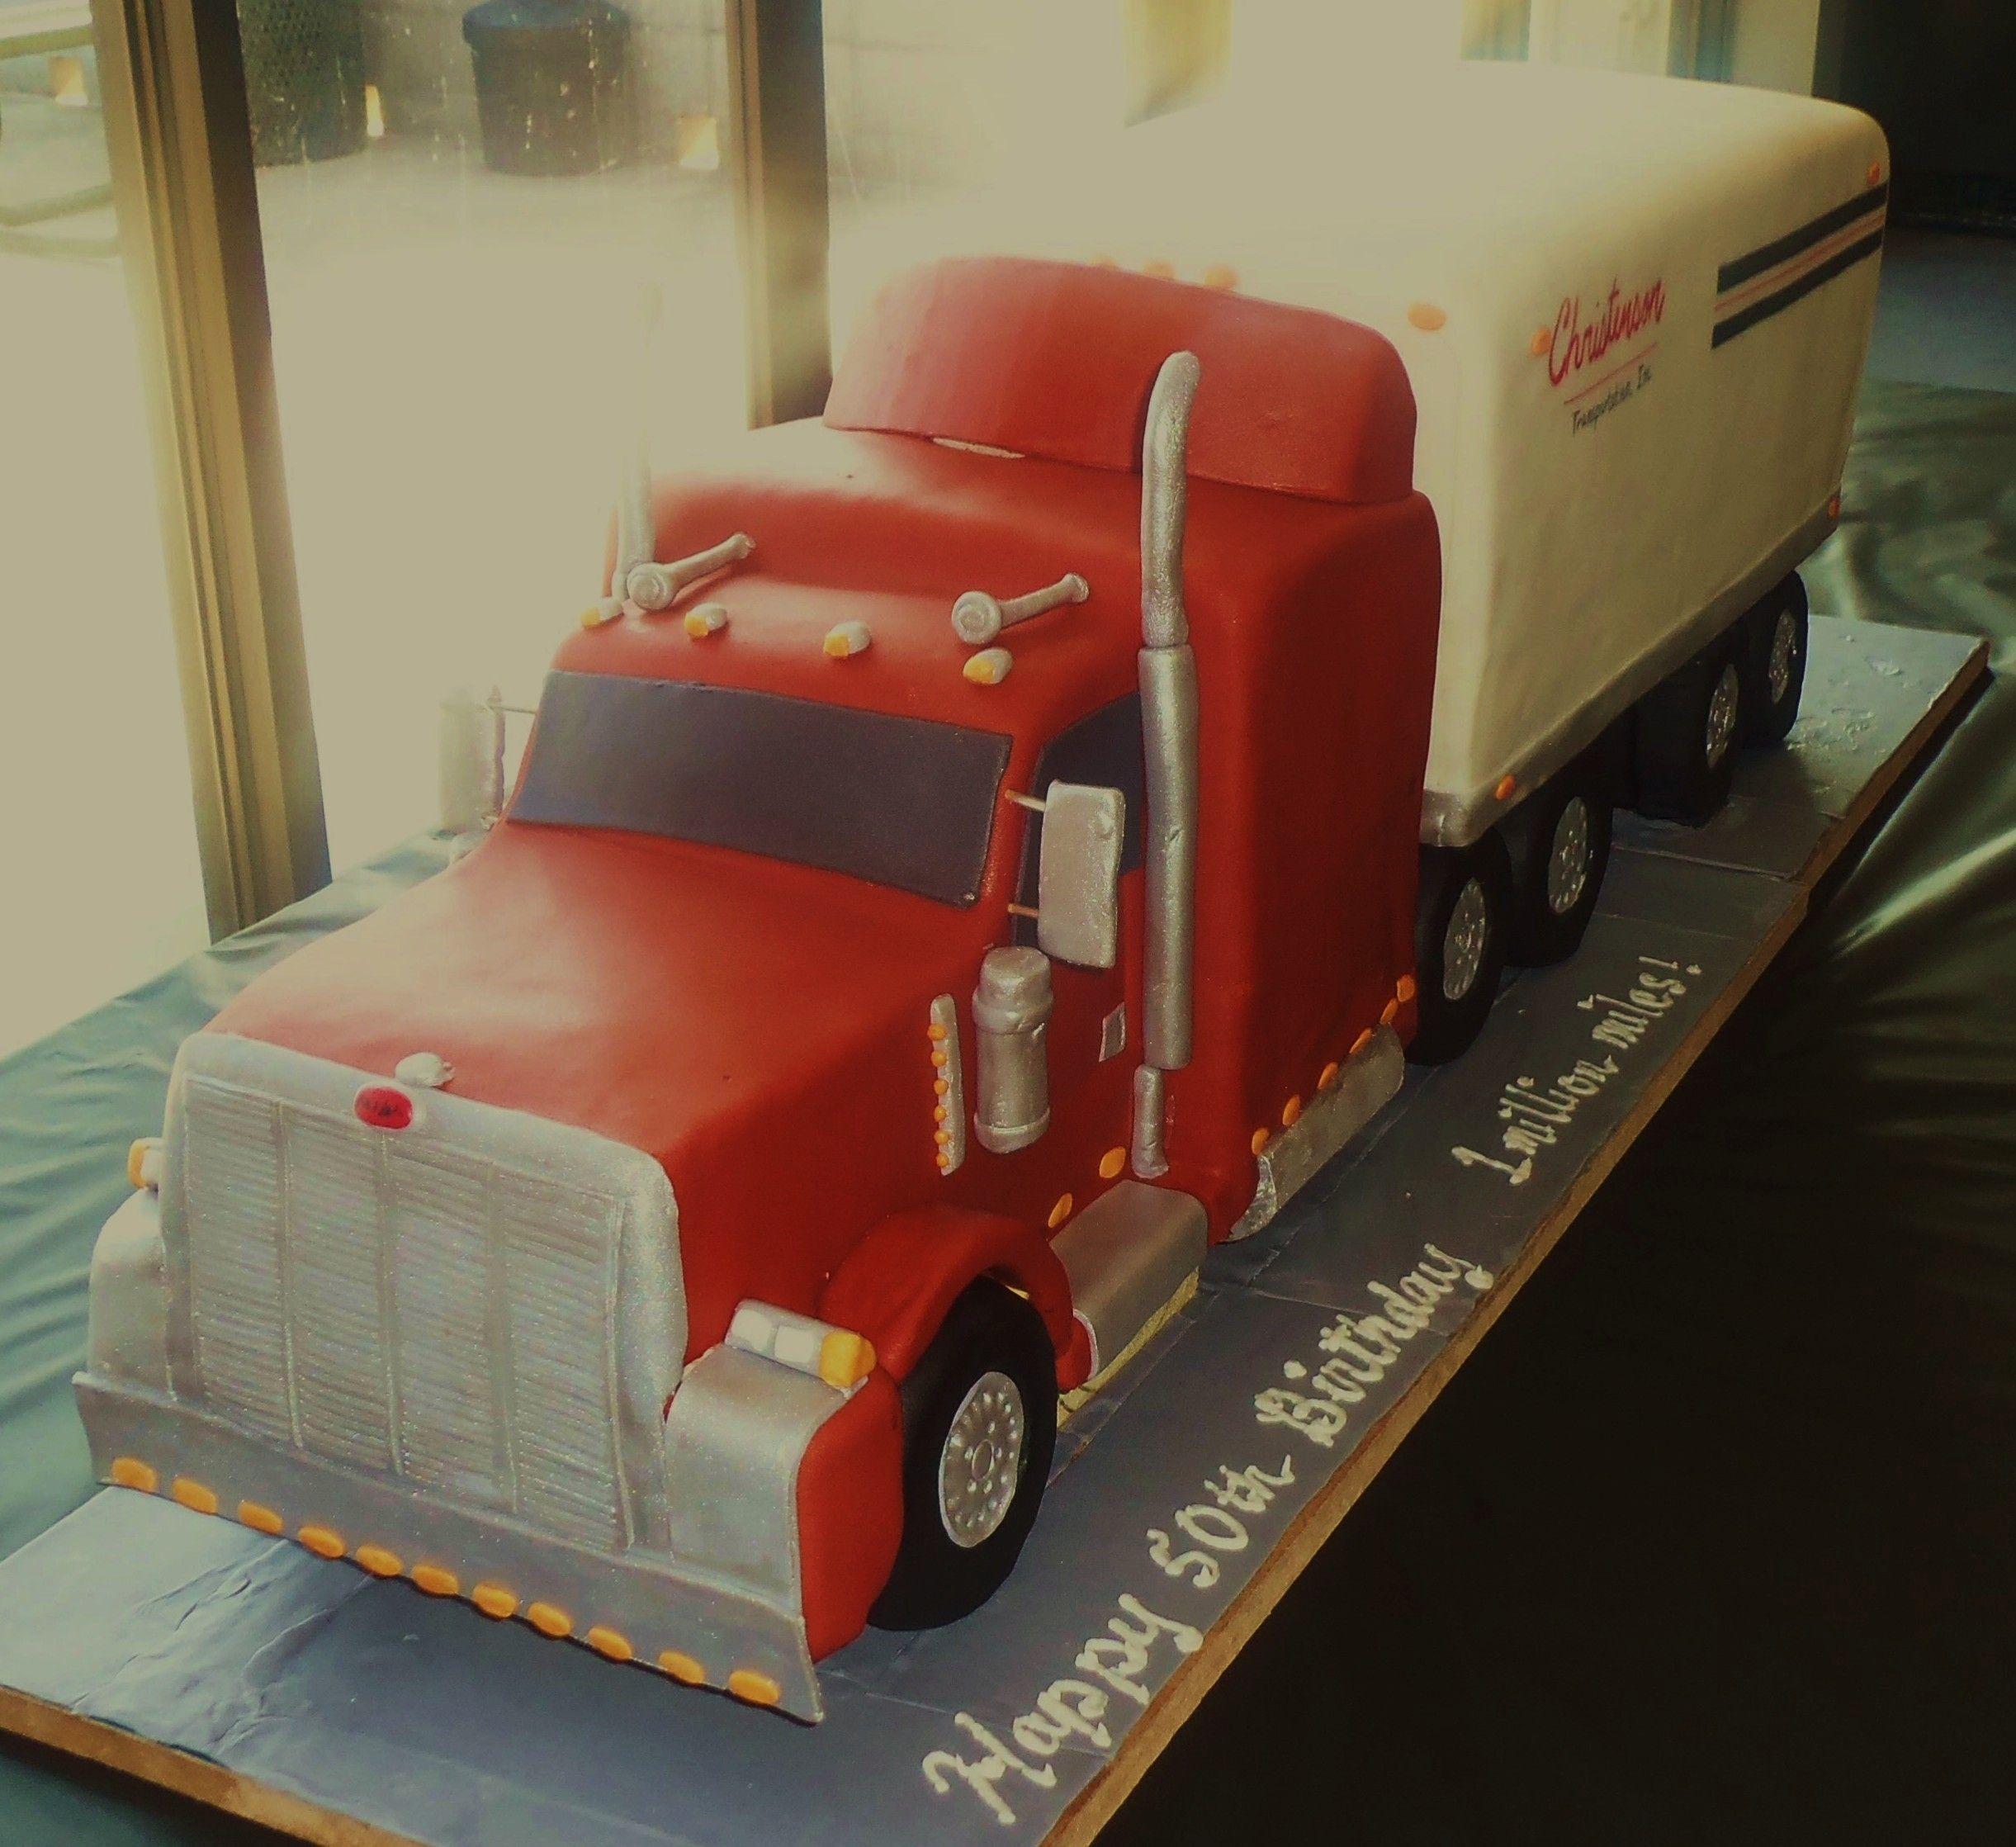 Peterbilt Tractor & Trailer Truck is three quarter